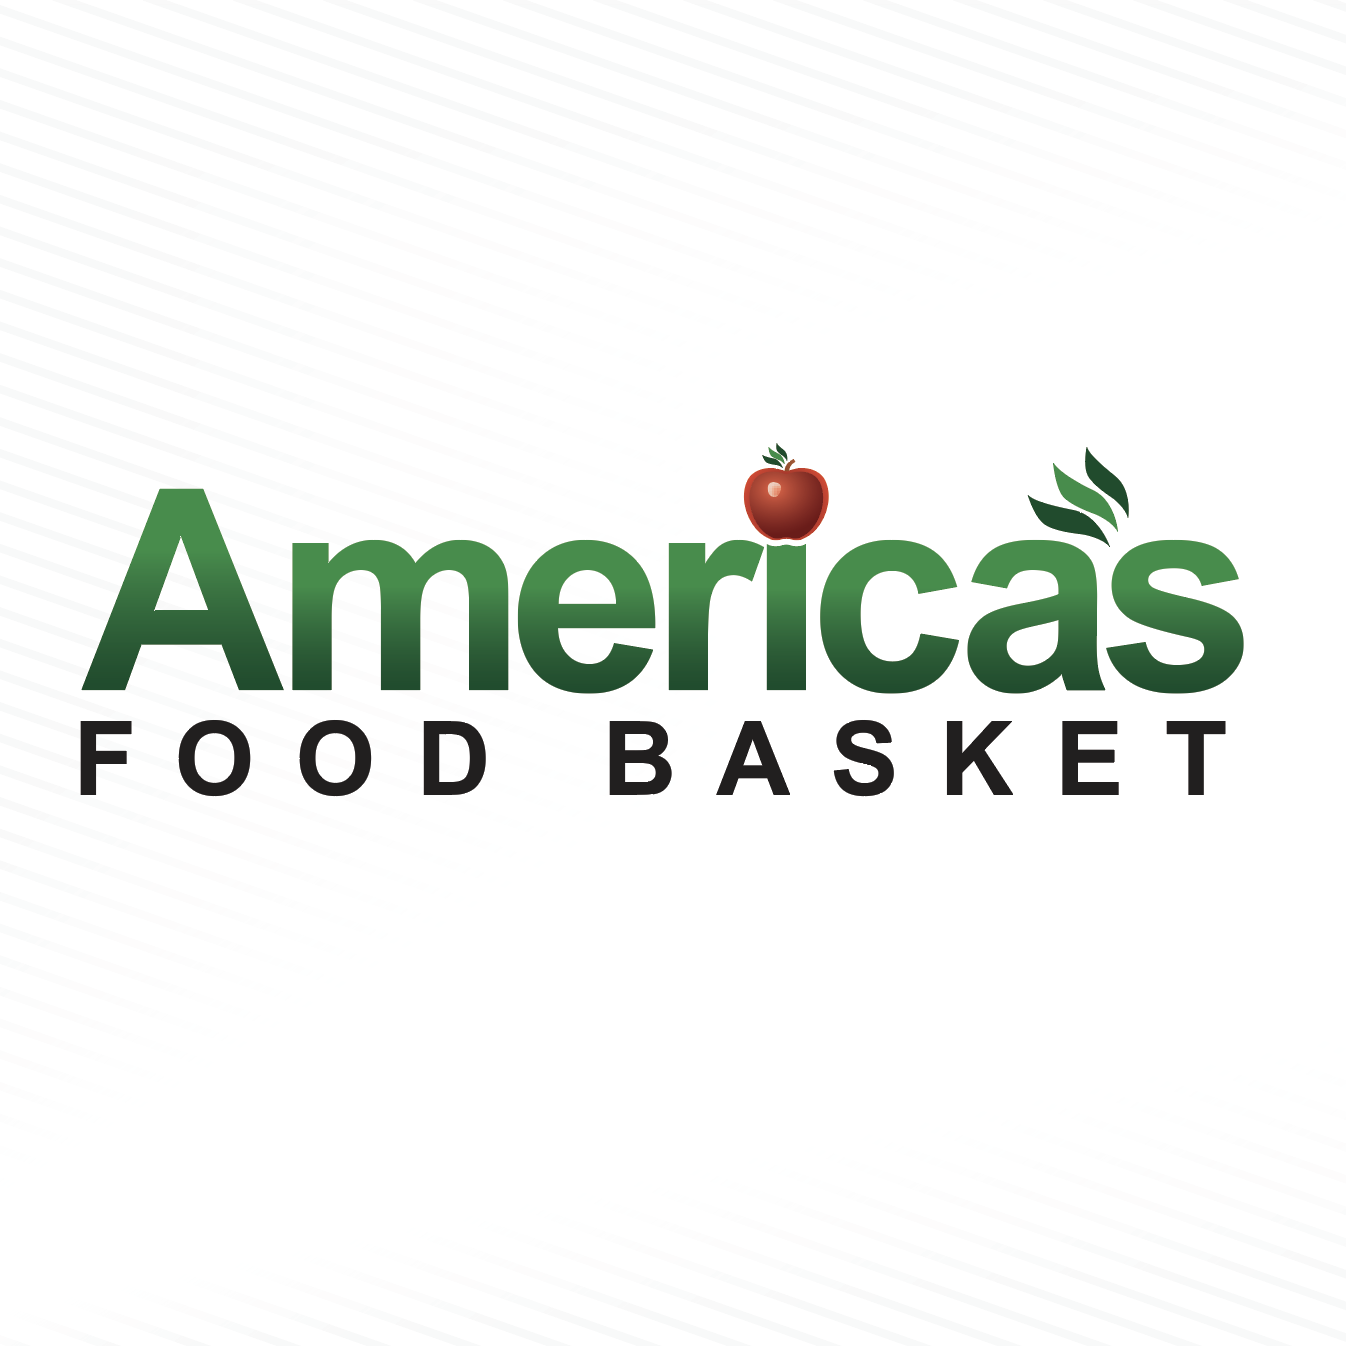 AFB Golden Mango Supermarkets